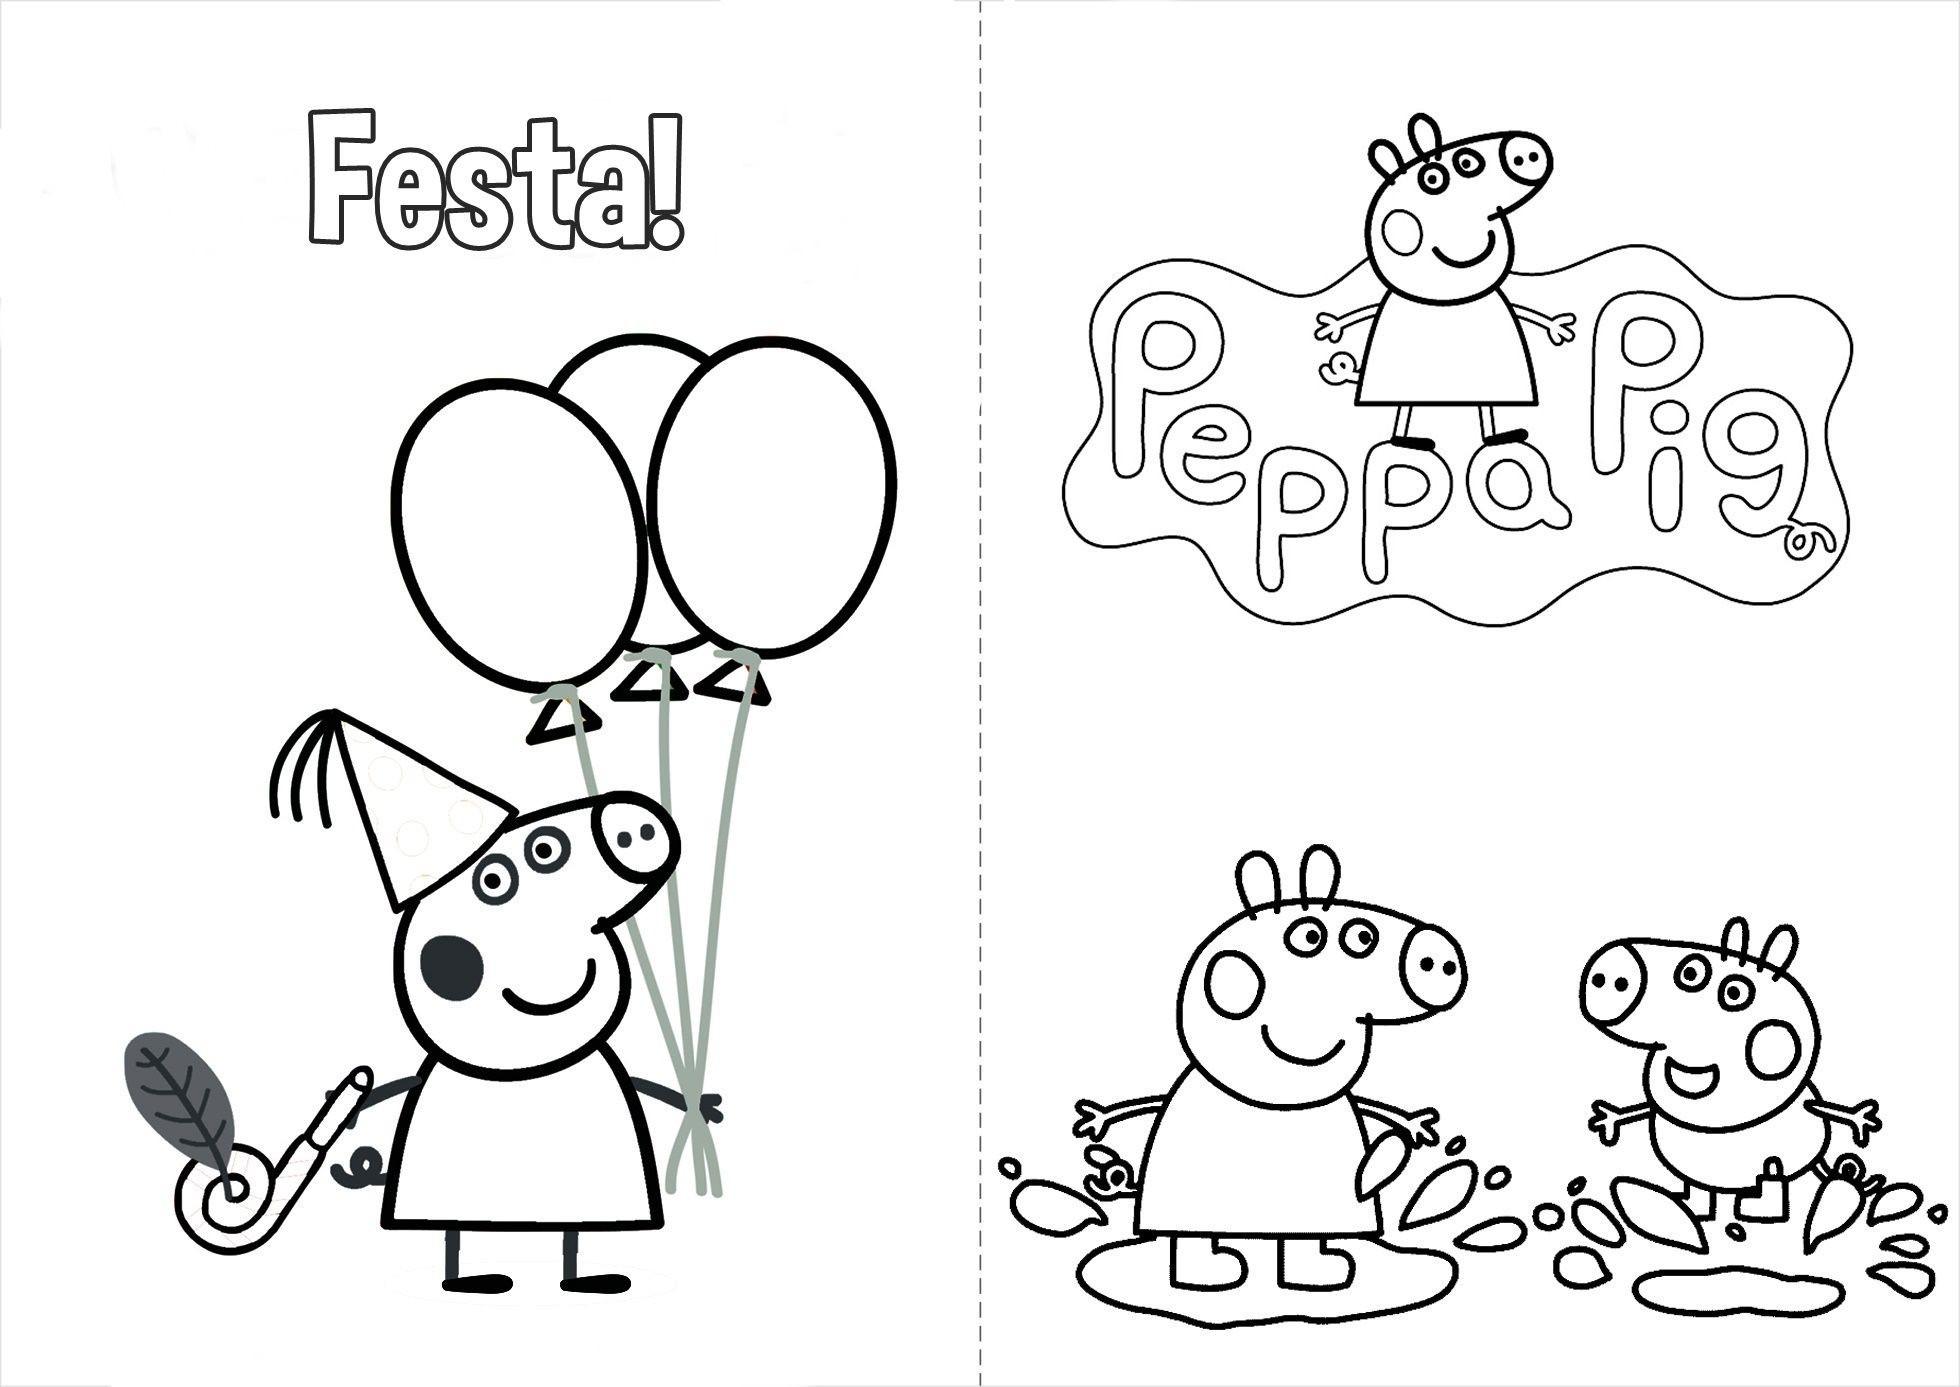 Peppa Wutz Malvorlage Genial Peppa Pig Colorir Peppa Pig Livro Para Colorir Schön Ausmalbilder Galerie